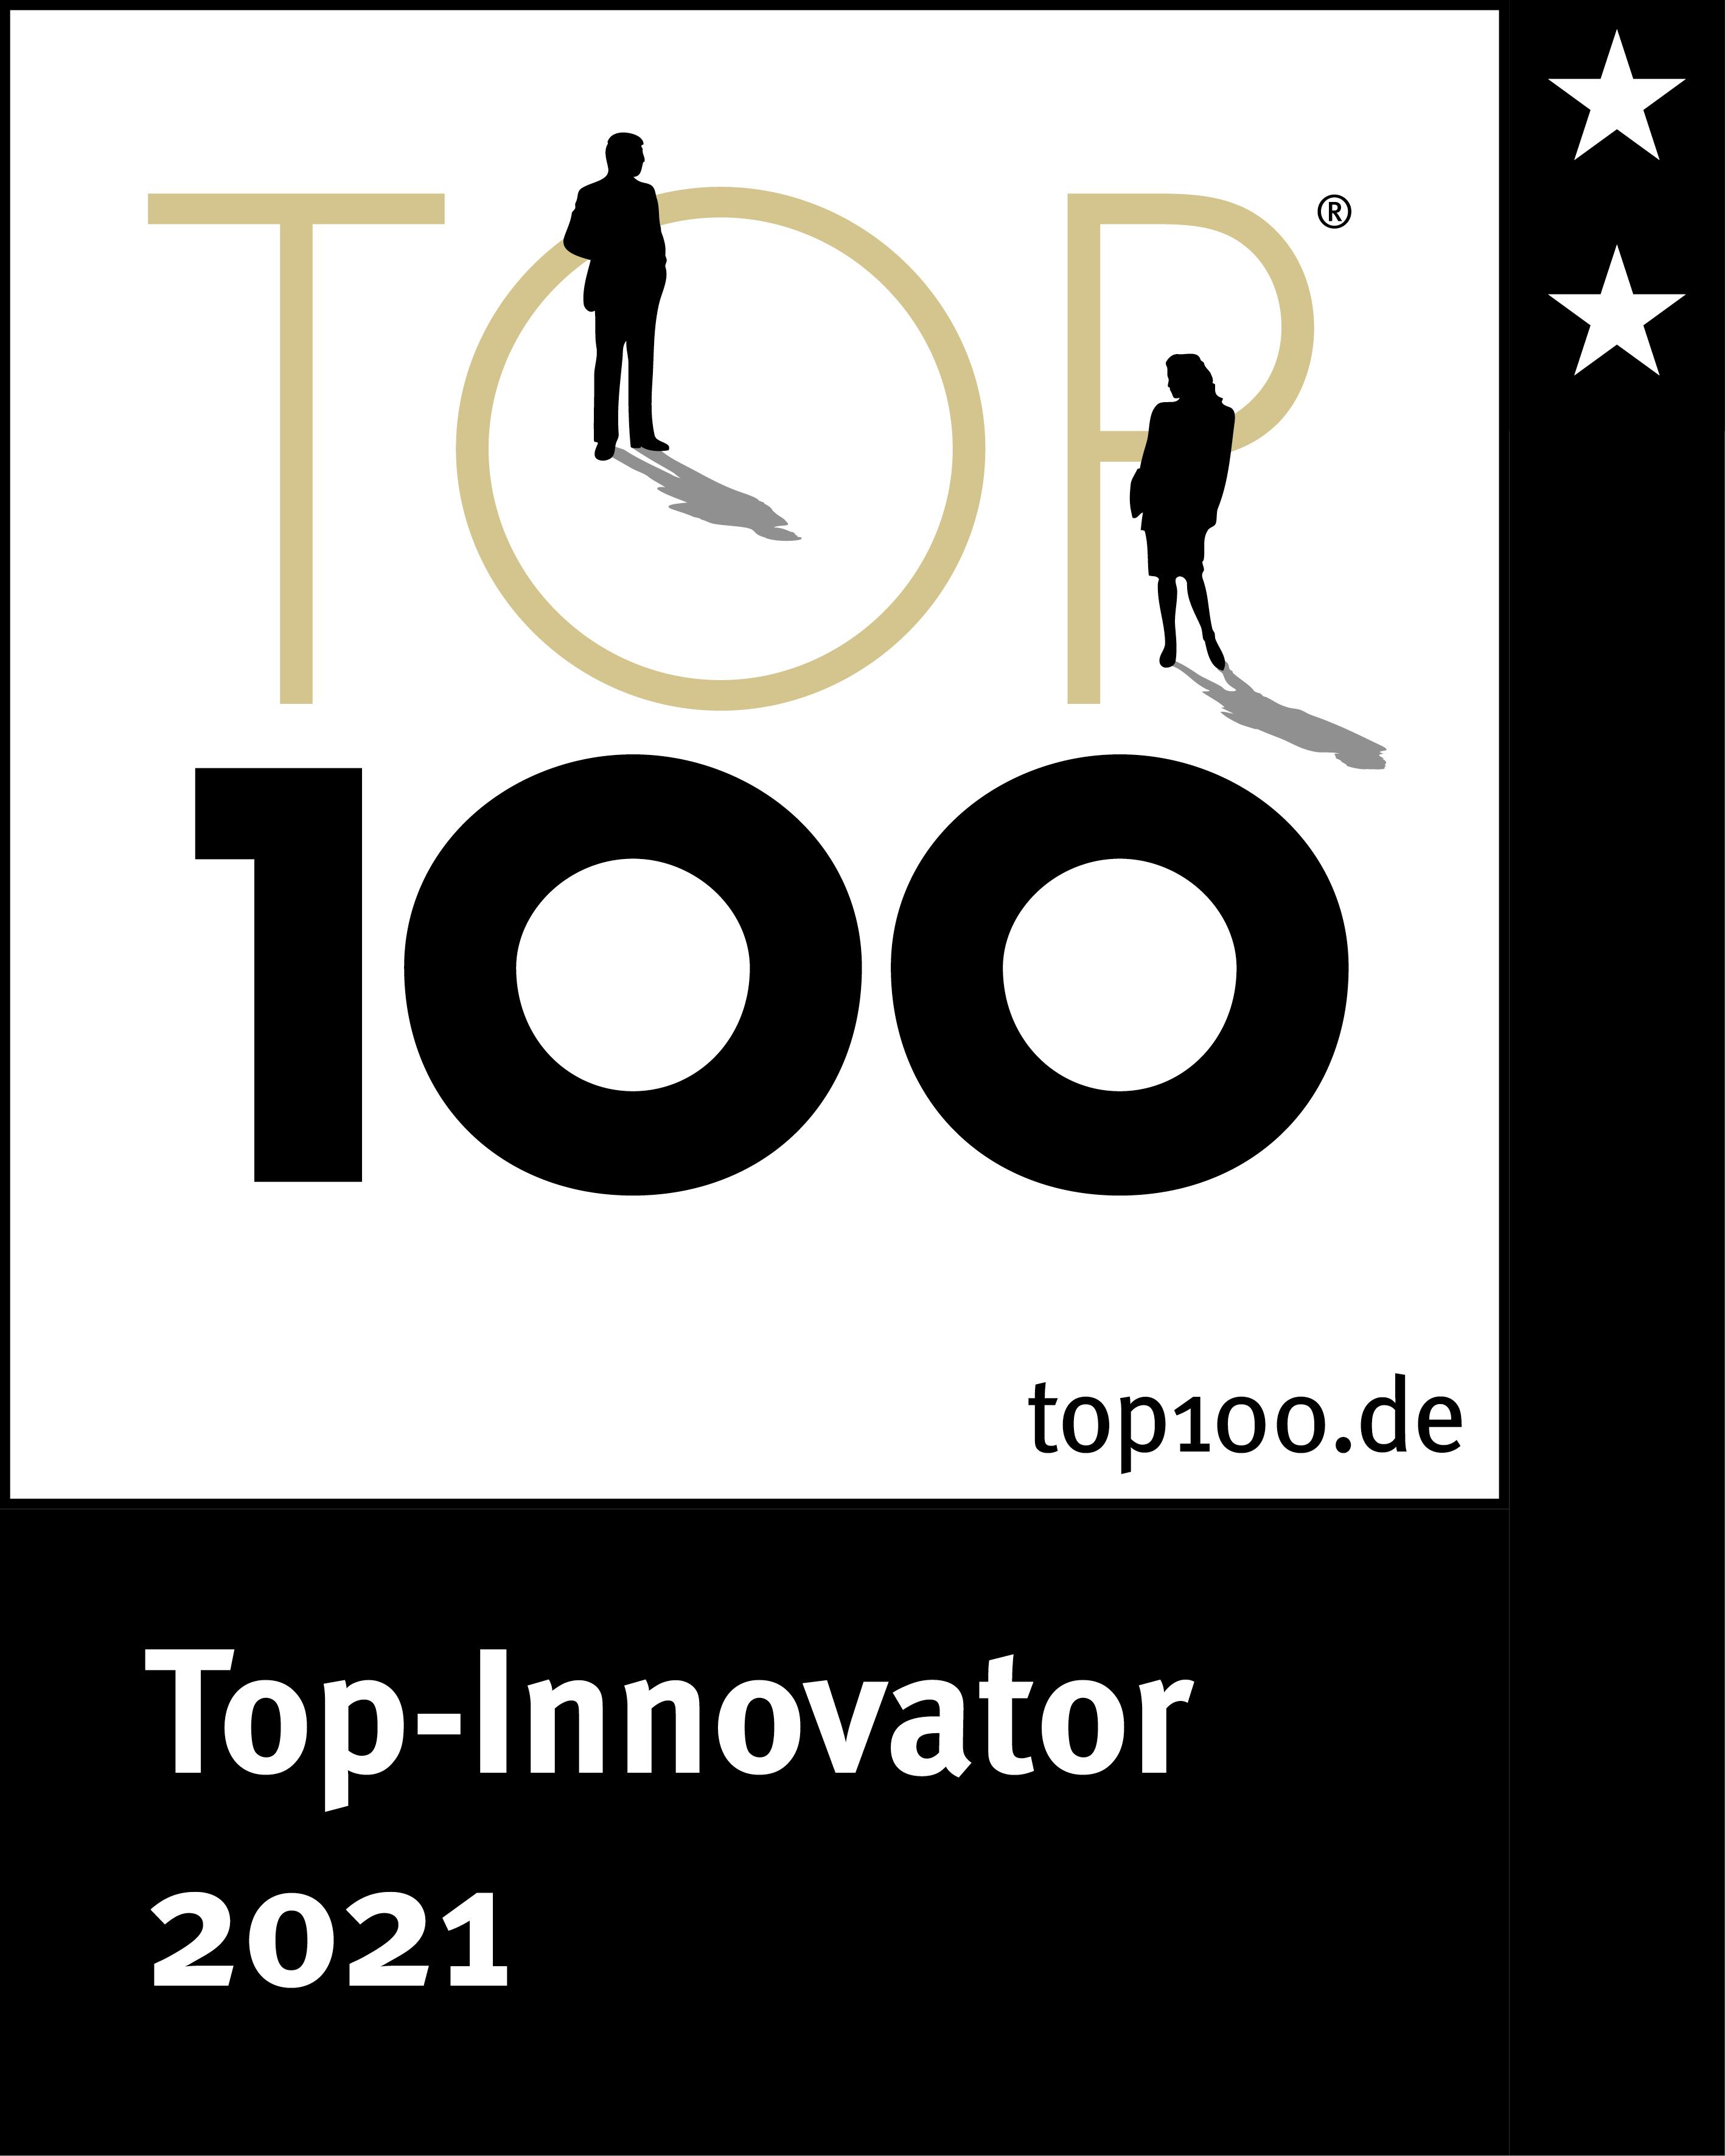 TOP100 innovator seal for MEISTERWERKE